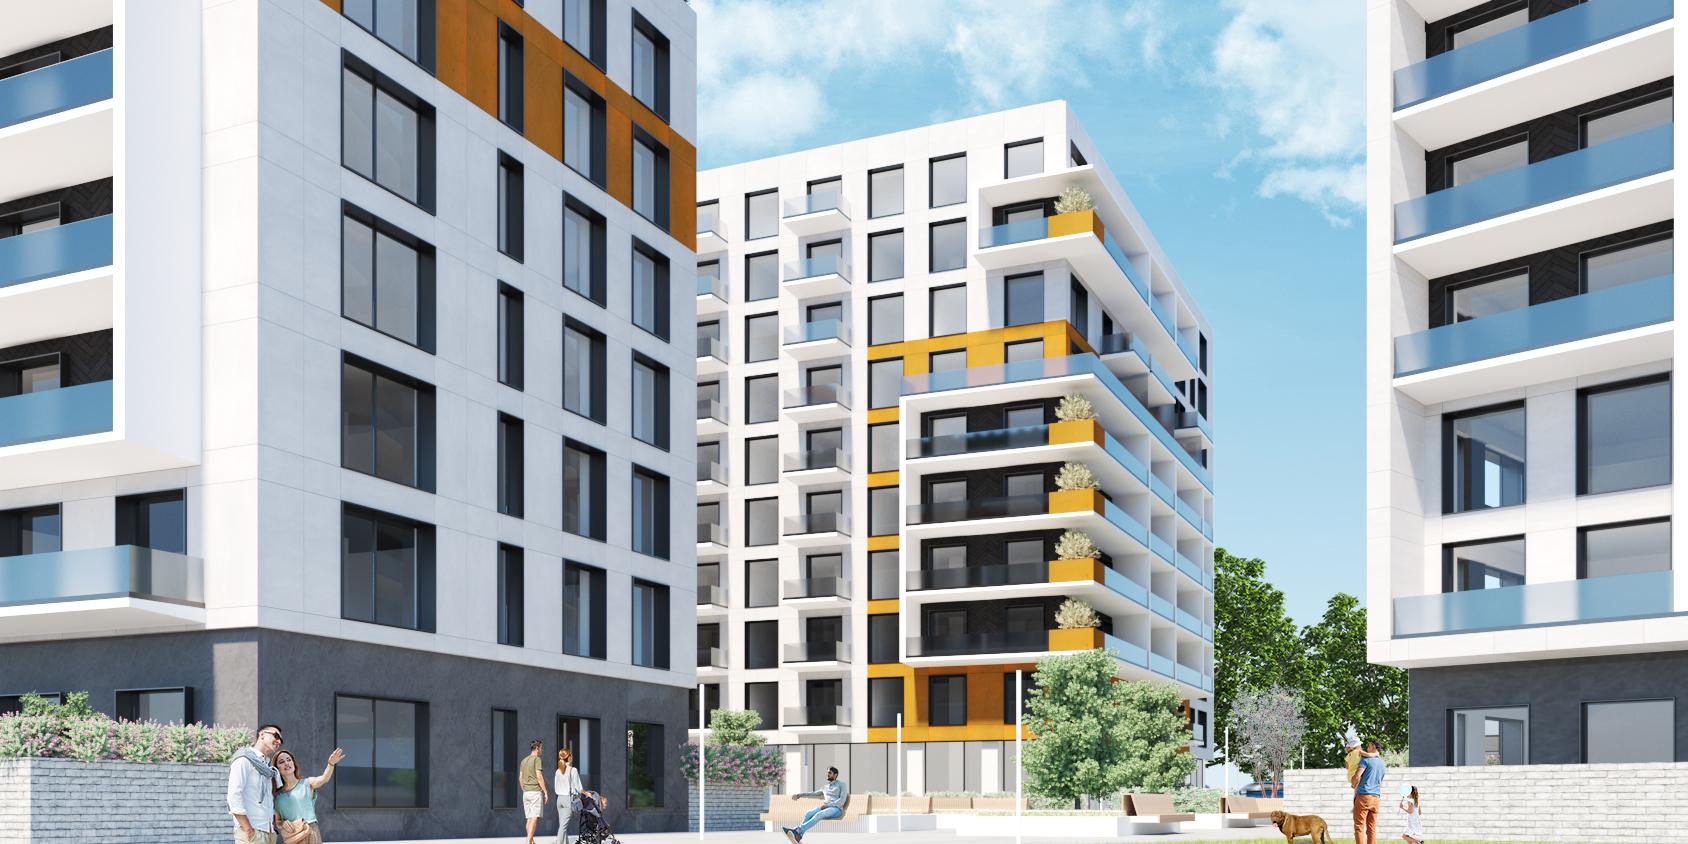 https://nbc-arhitect.ro/wp-content/uploads/2020/10/NBC-Arhitect-_-residentials-_-Glucoza-Residence-2-_-Bucharest-Romania_6.jpg